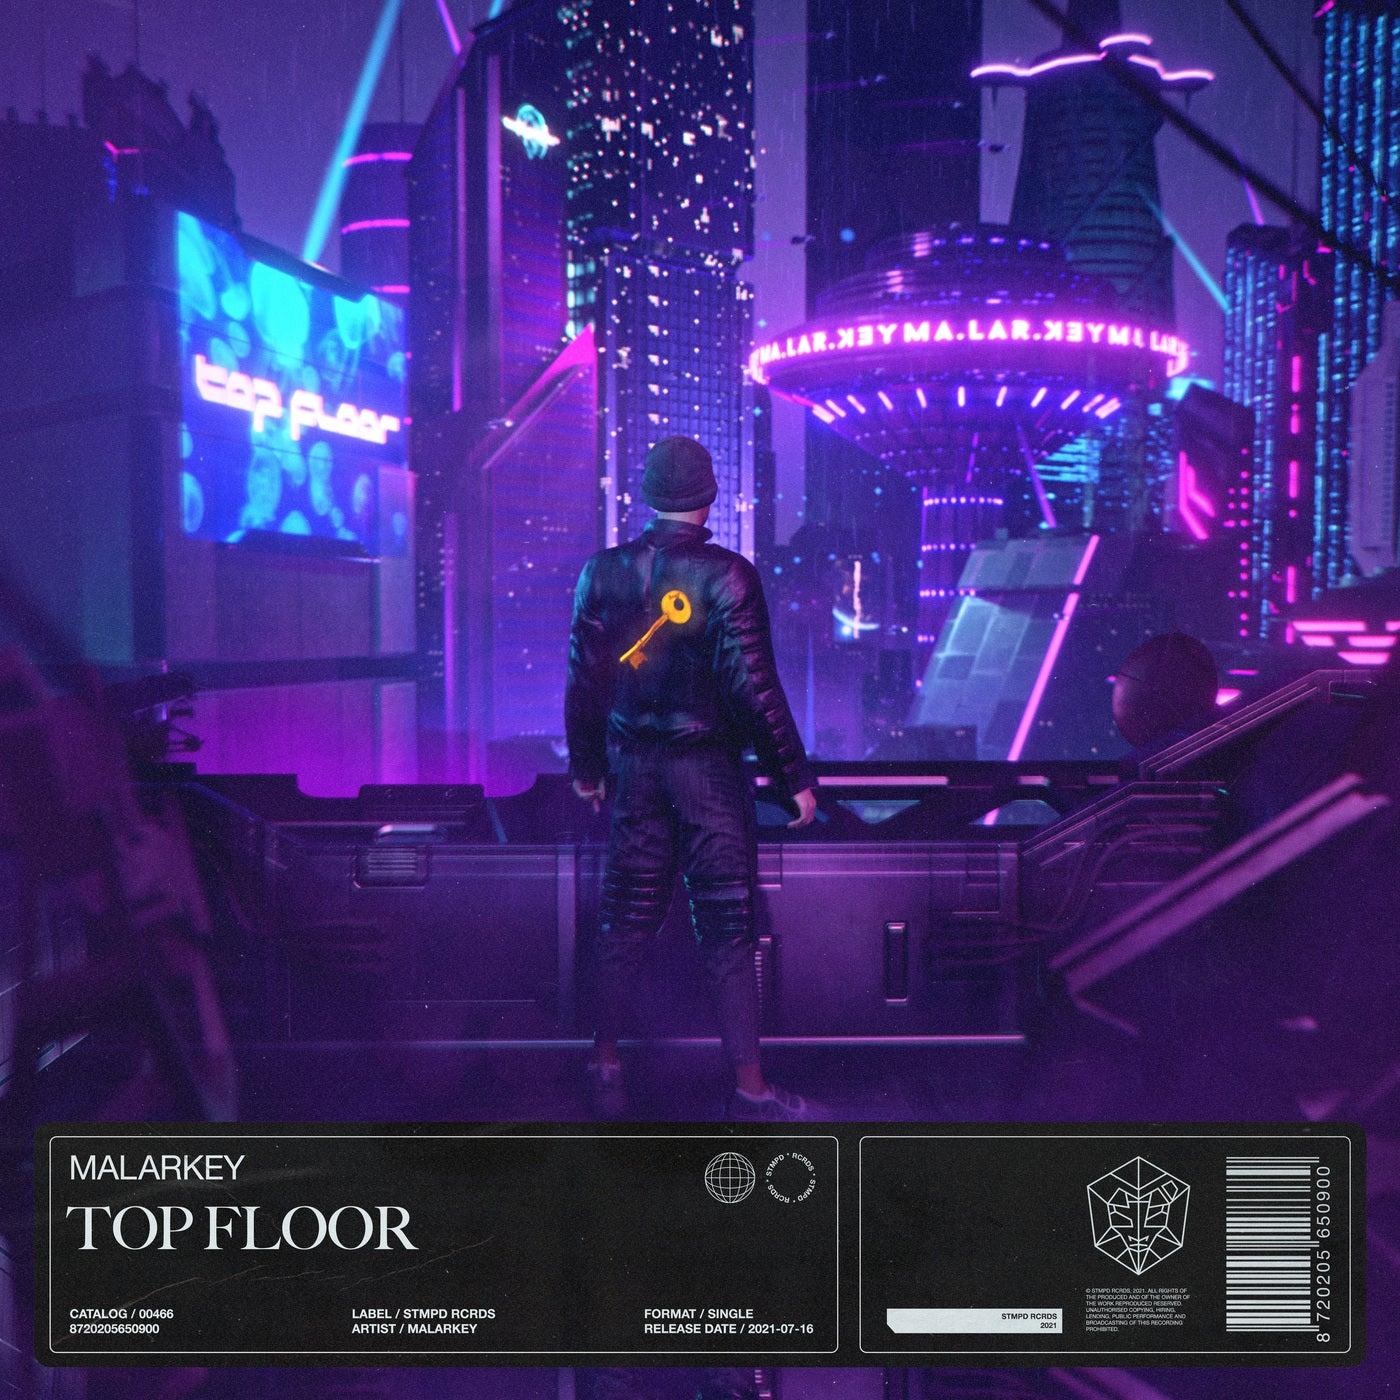 Top Floor (Extended Mix)